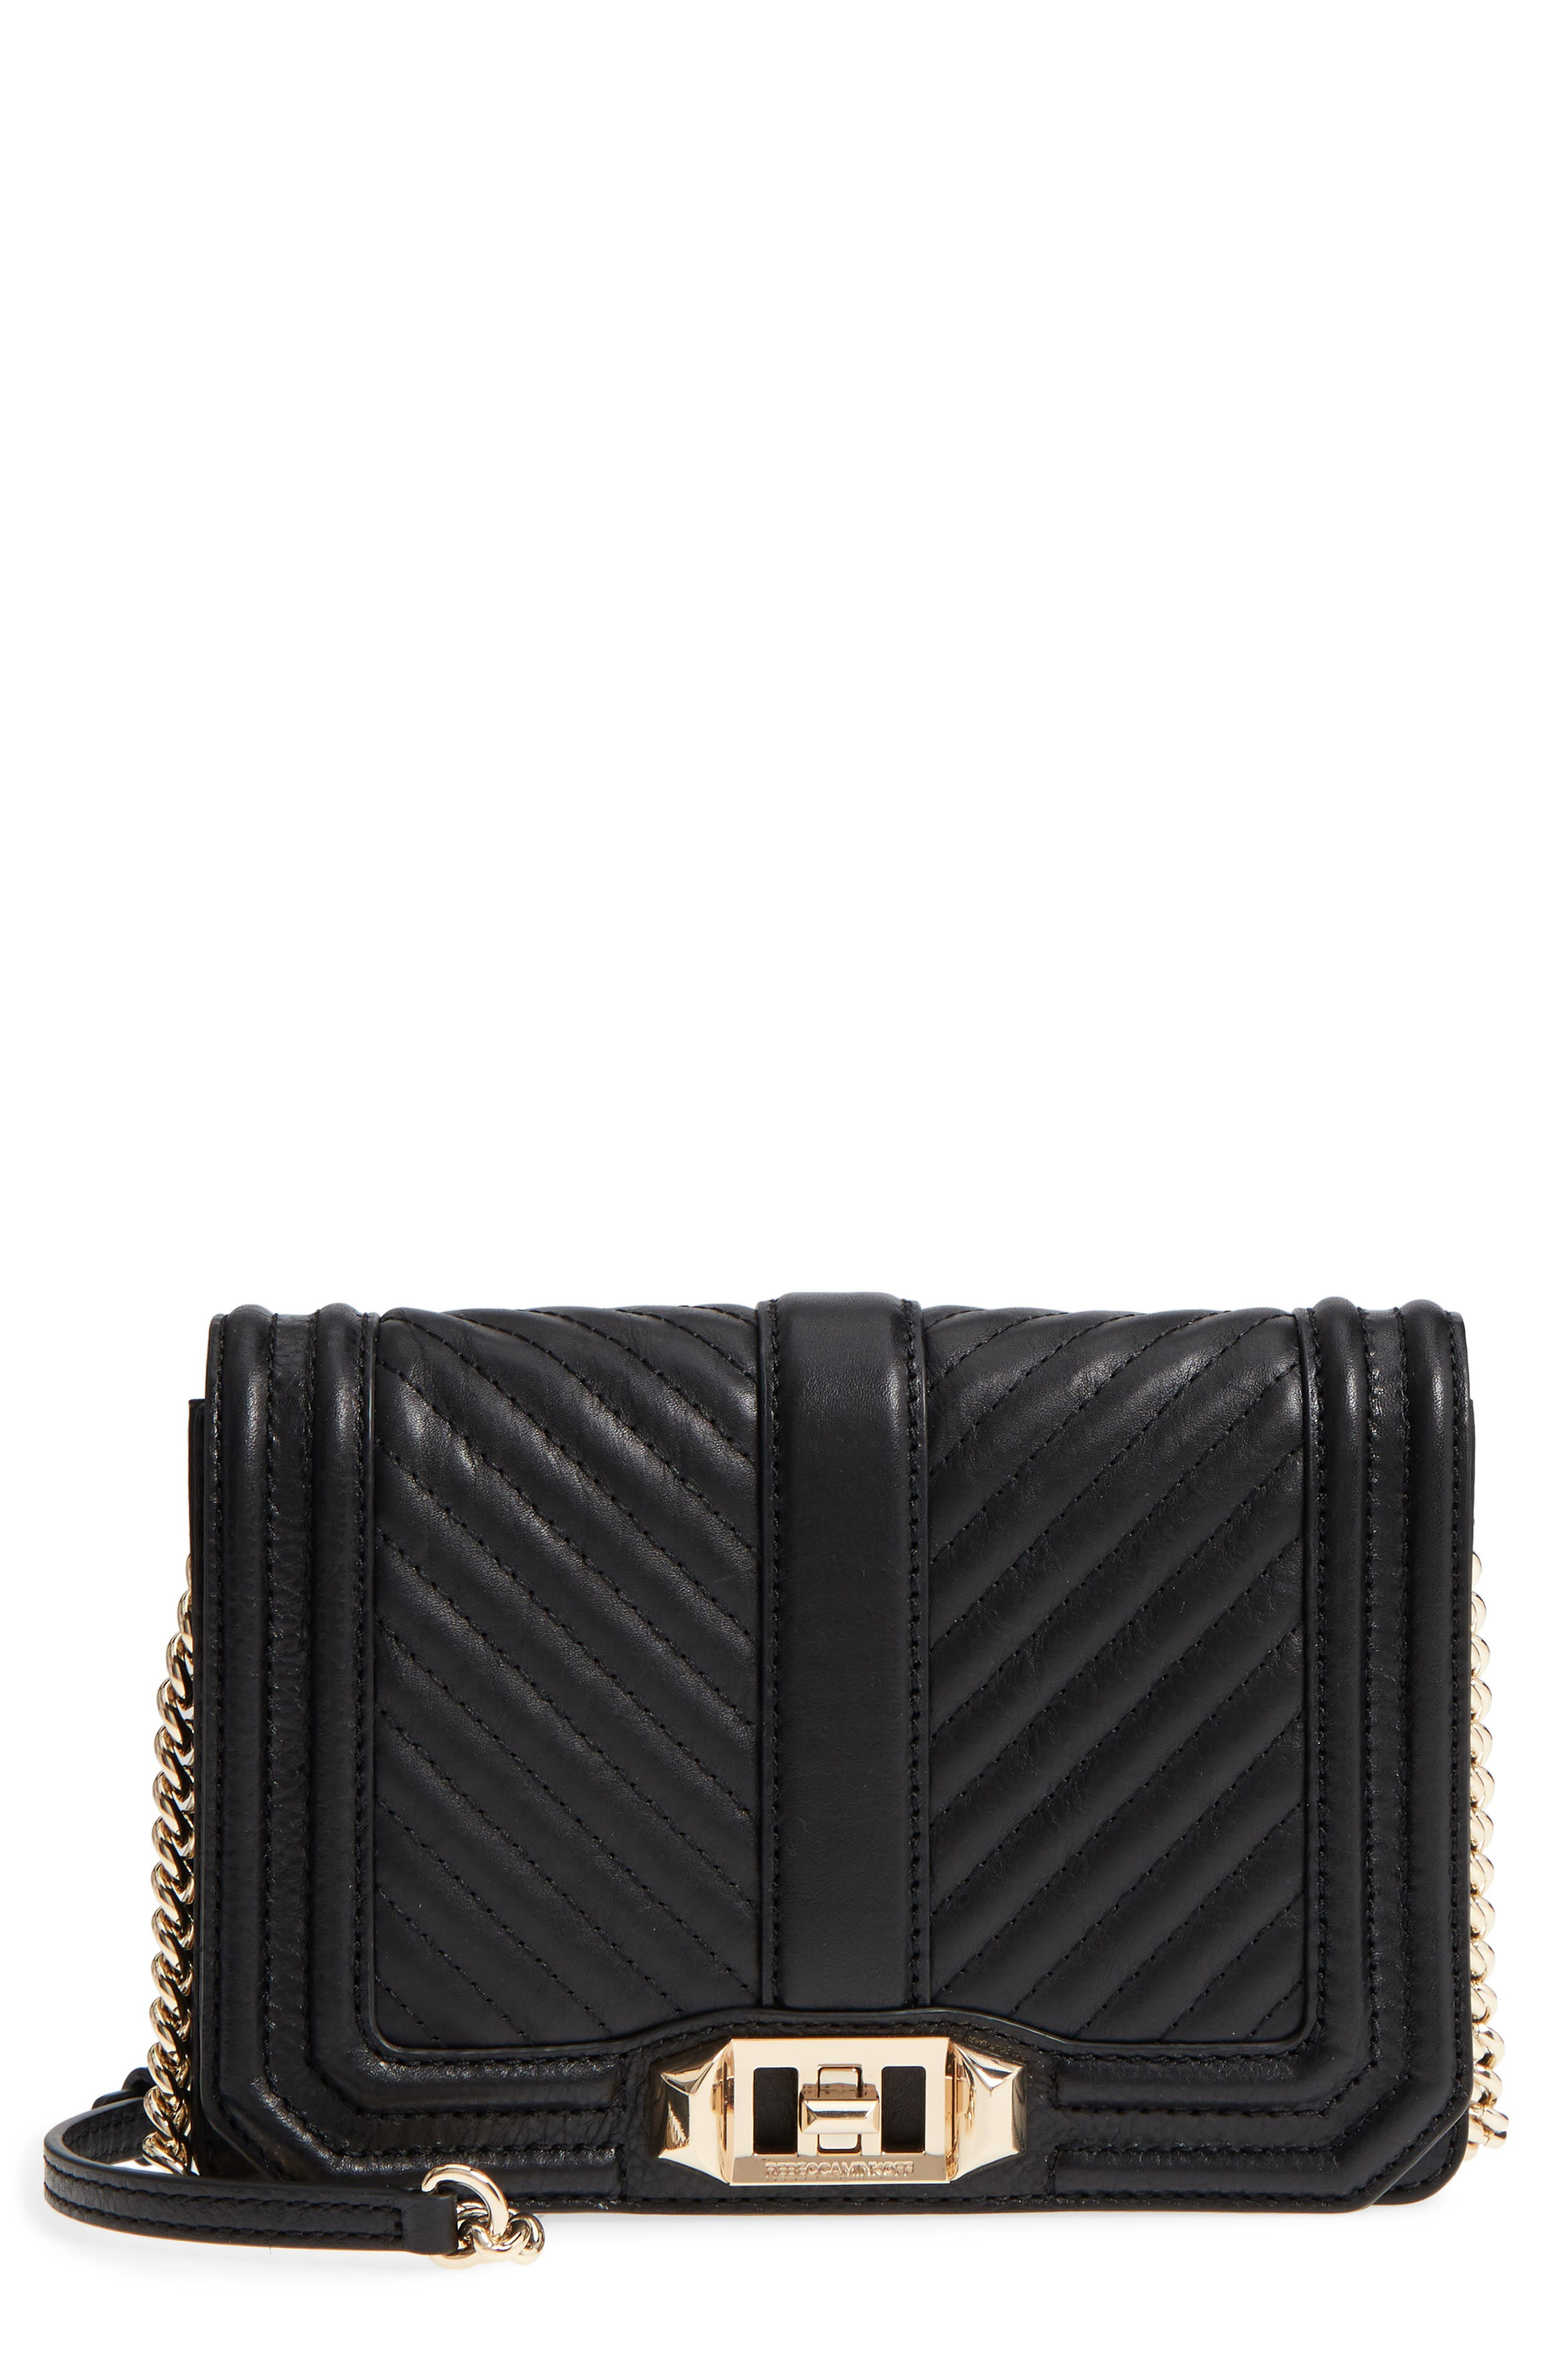 Main Image - Rebecca Minkoff Small Love Leather Crossbody Bag